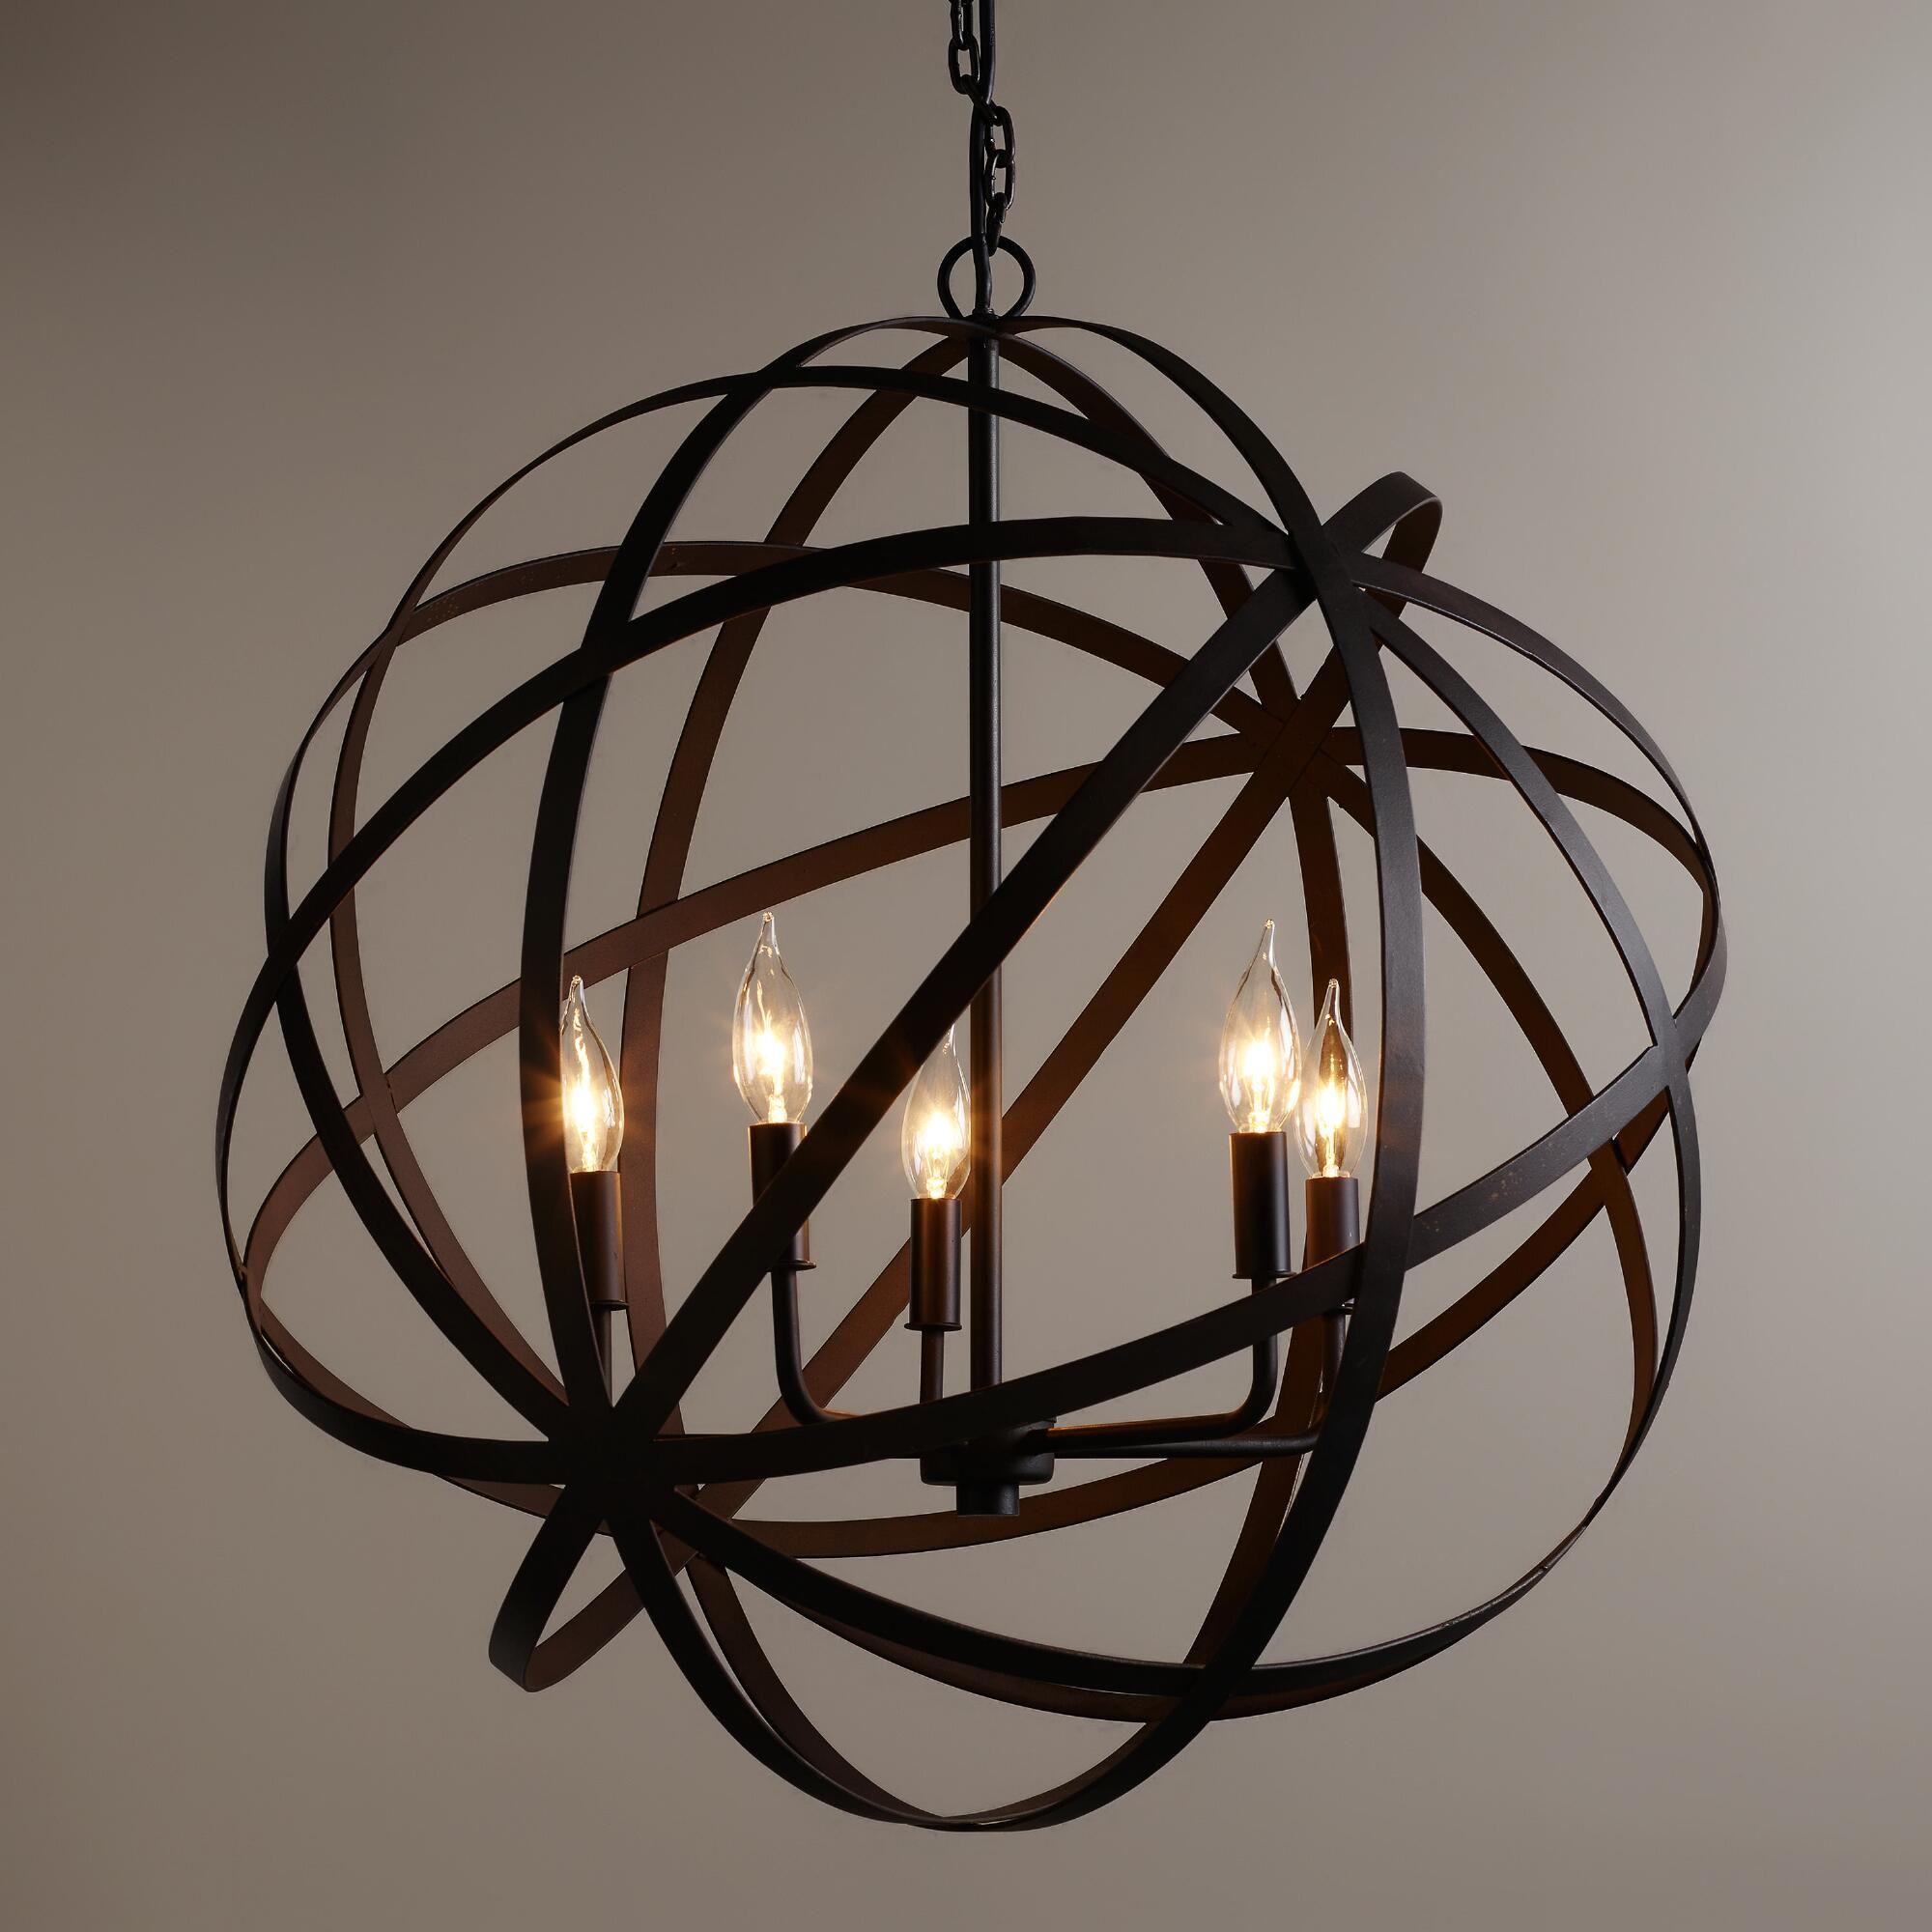 world market large metal orb chandelier Google Search